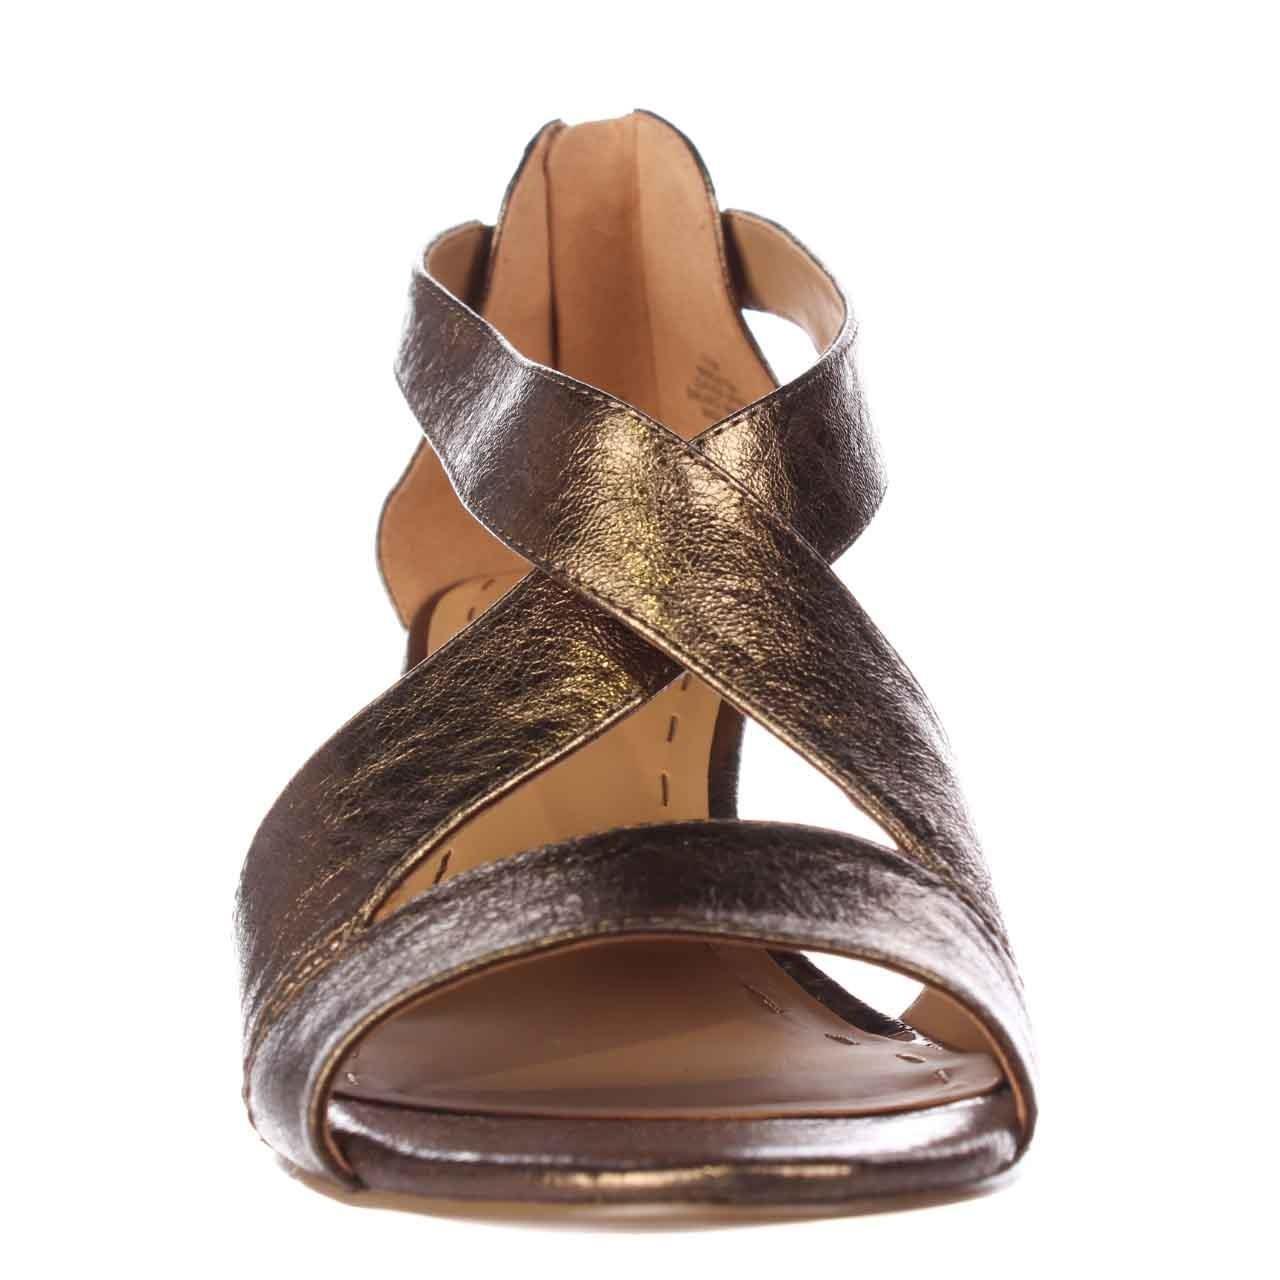 Nine West Ronton Cross Strap Wedge Sandals Gold In